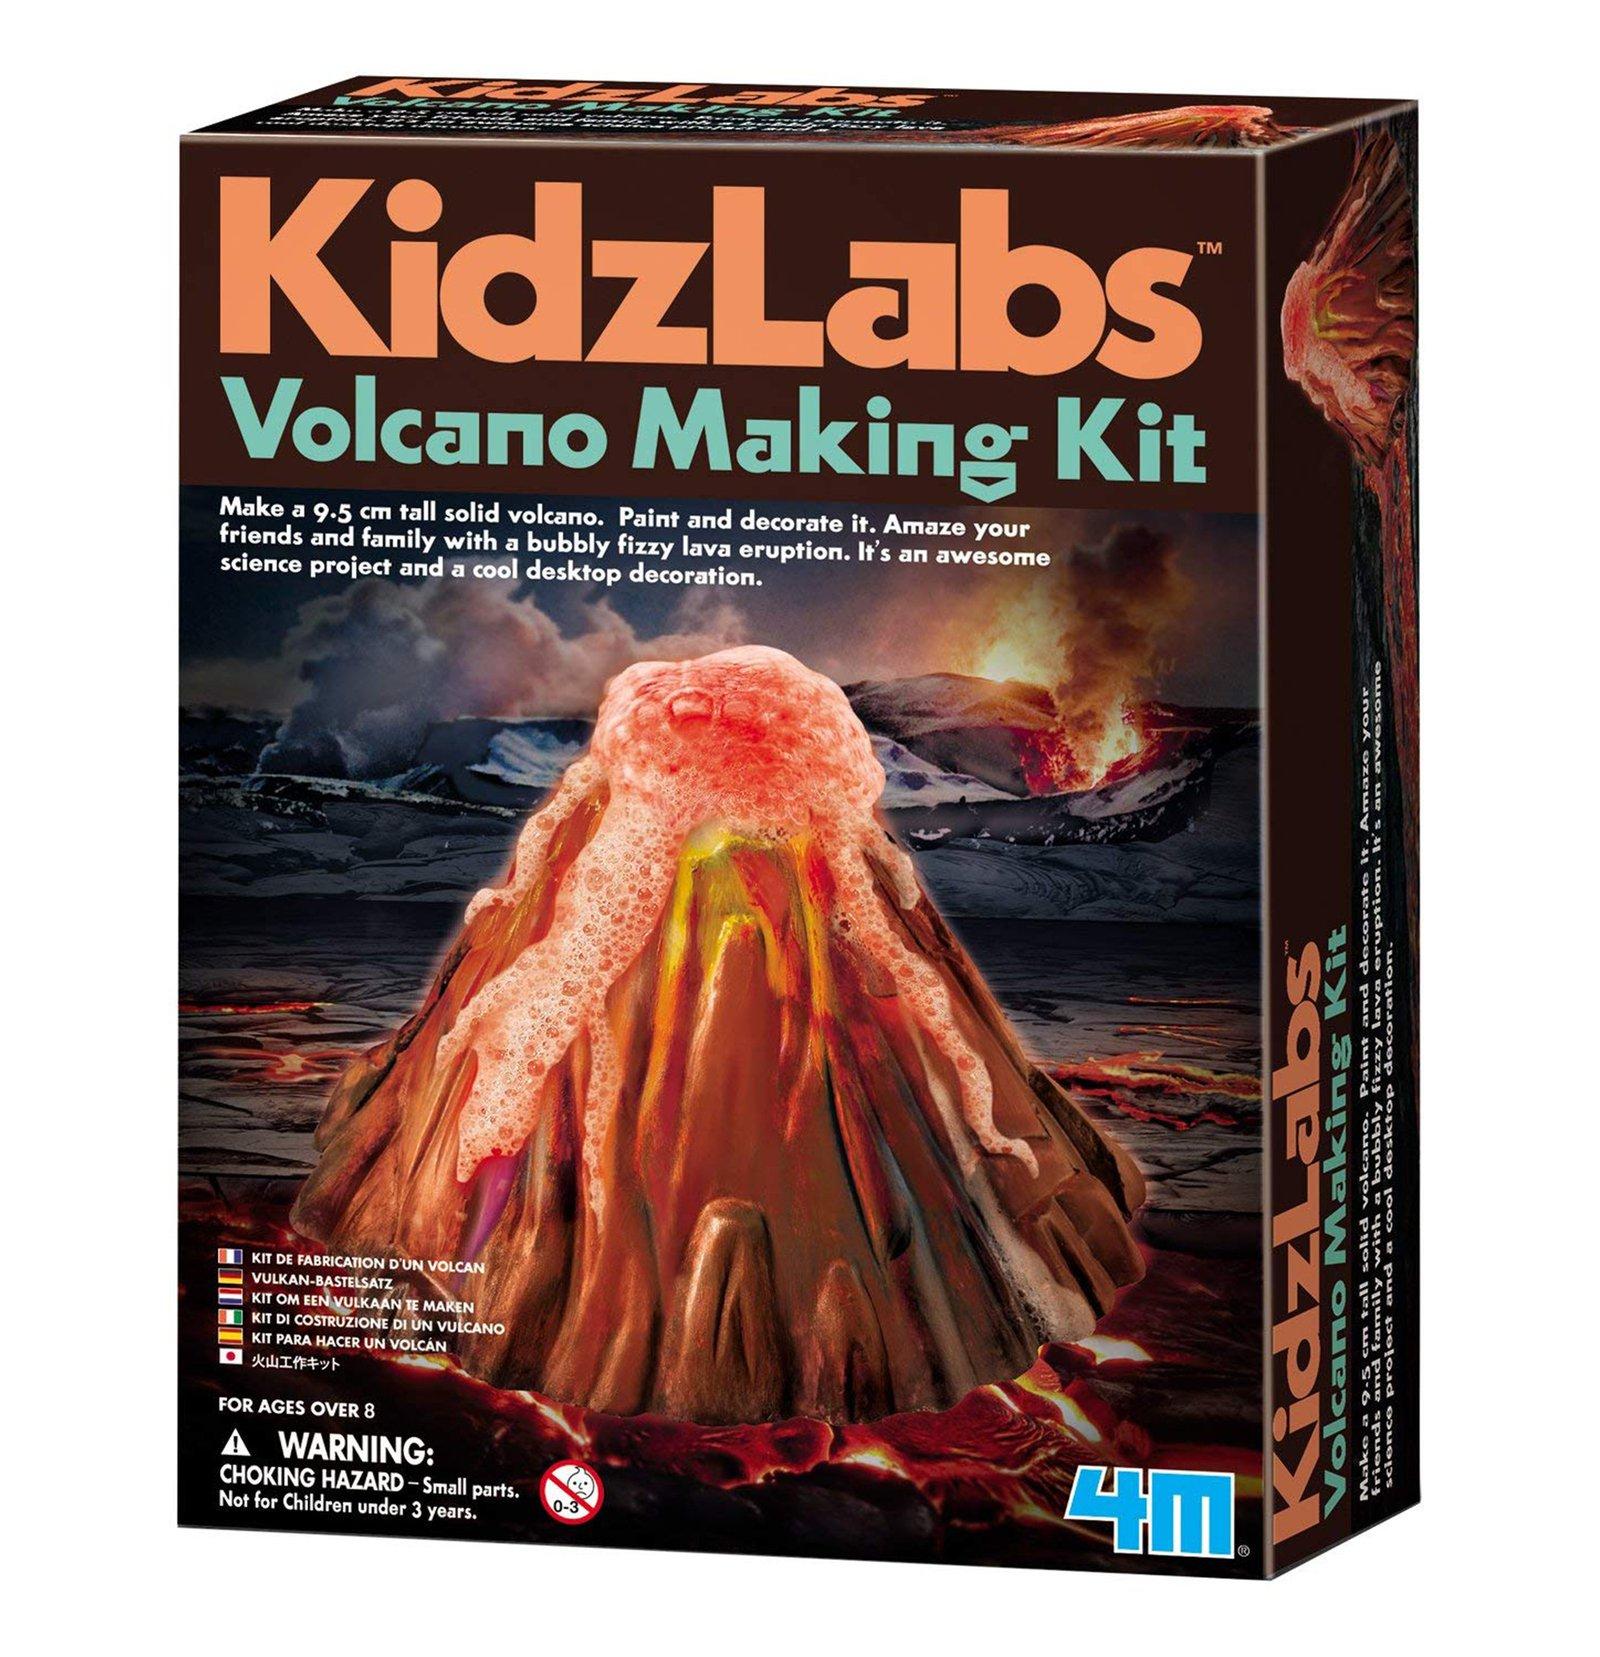 KidzLabs Volcano Making Kit